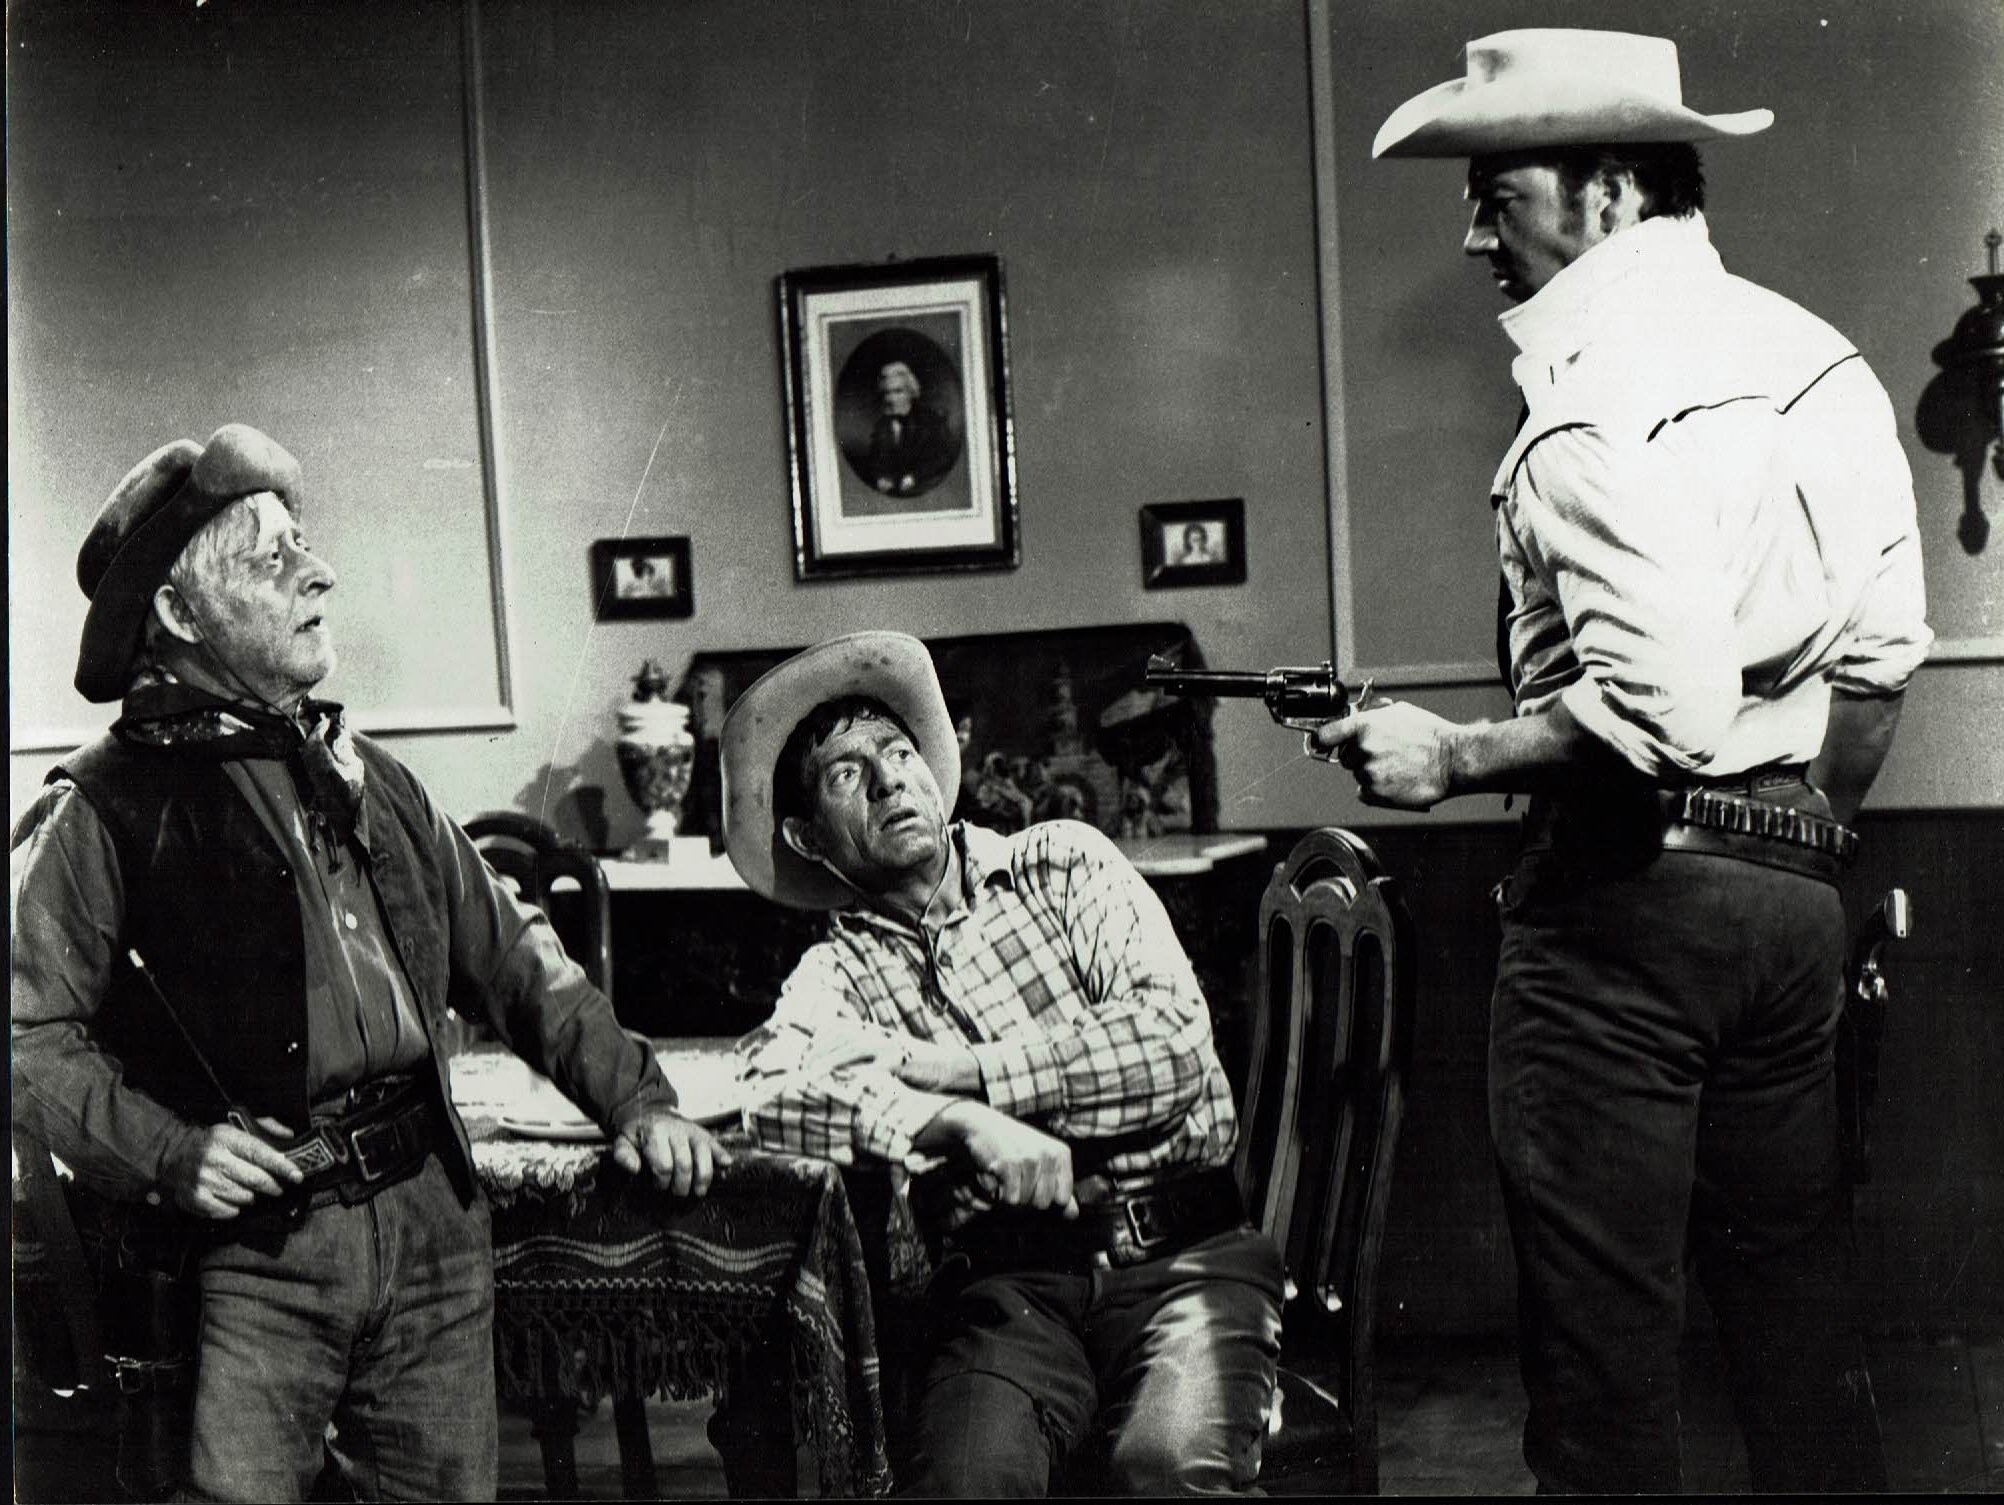 Mickey Hargitay in Uno straniero a Sacramento (1965)